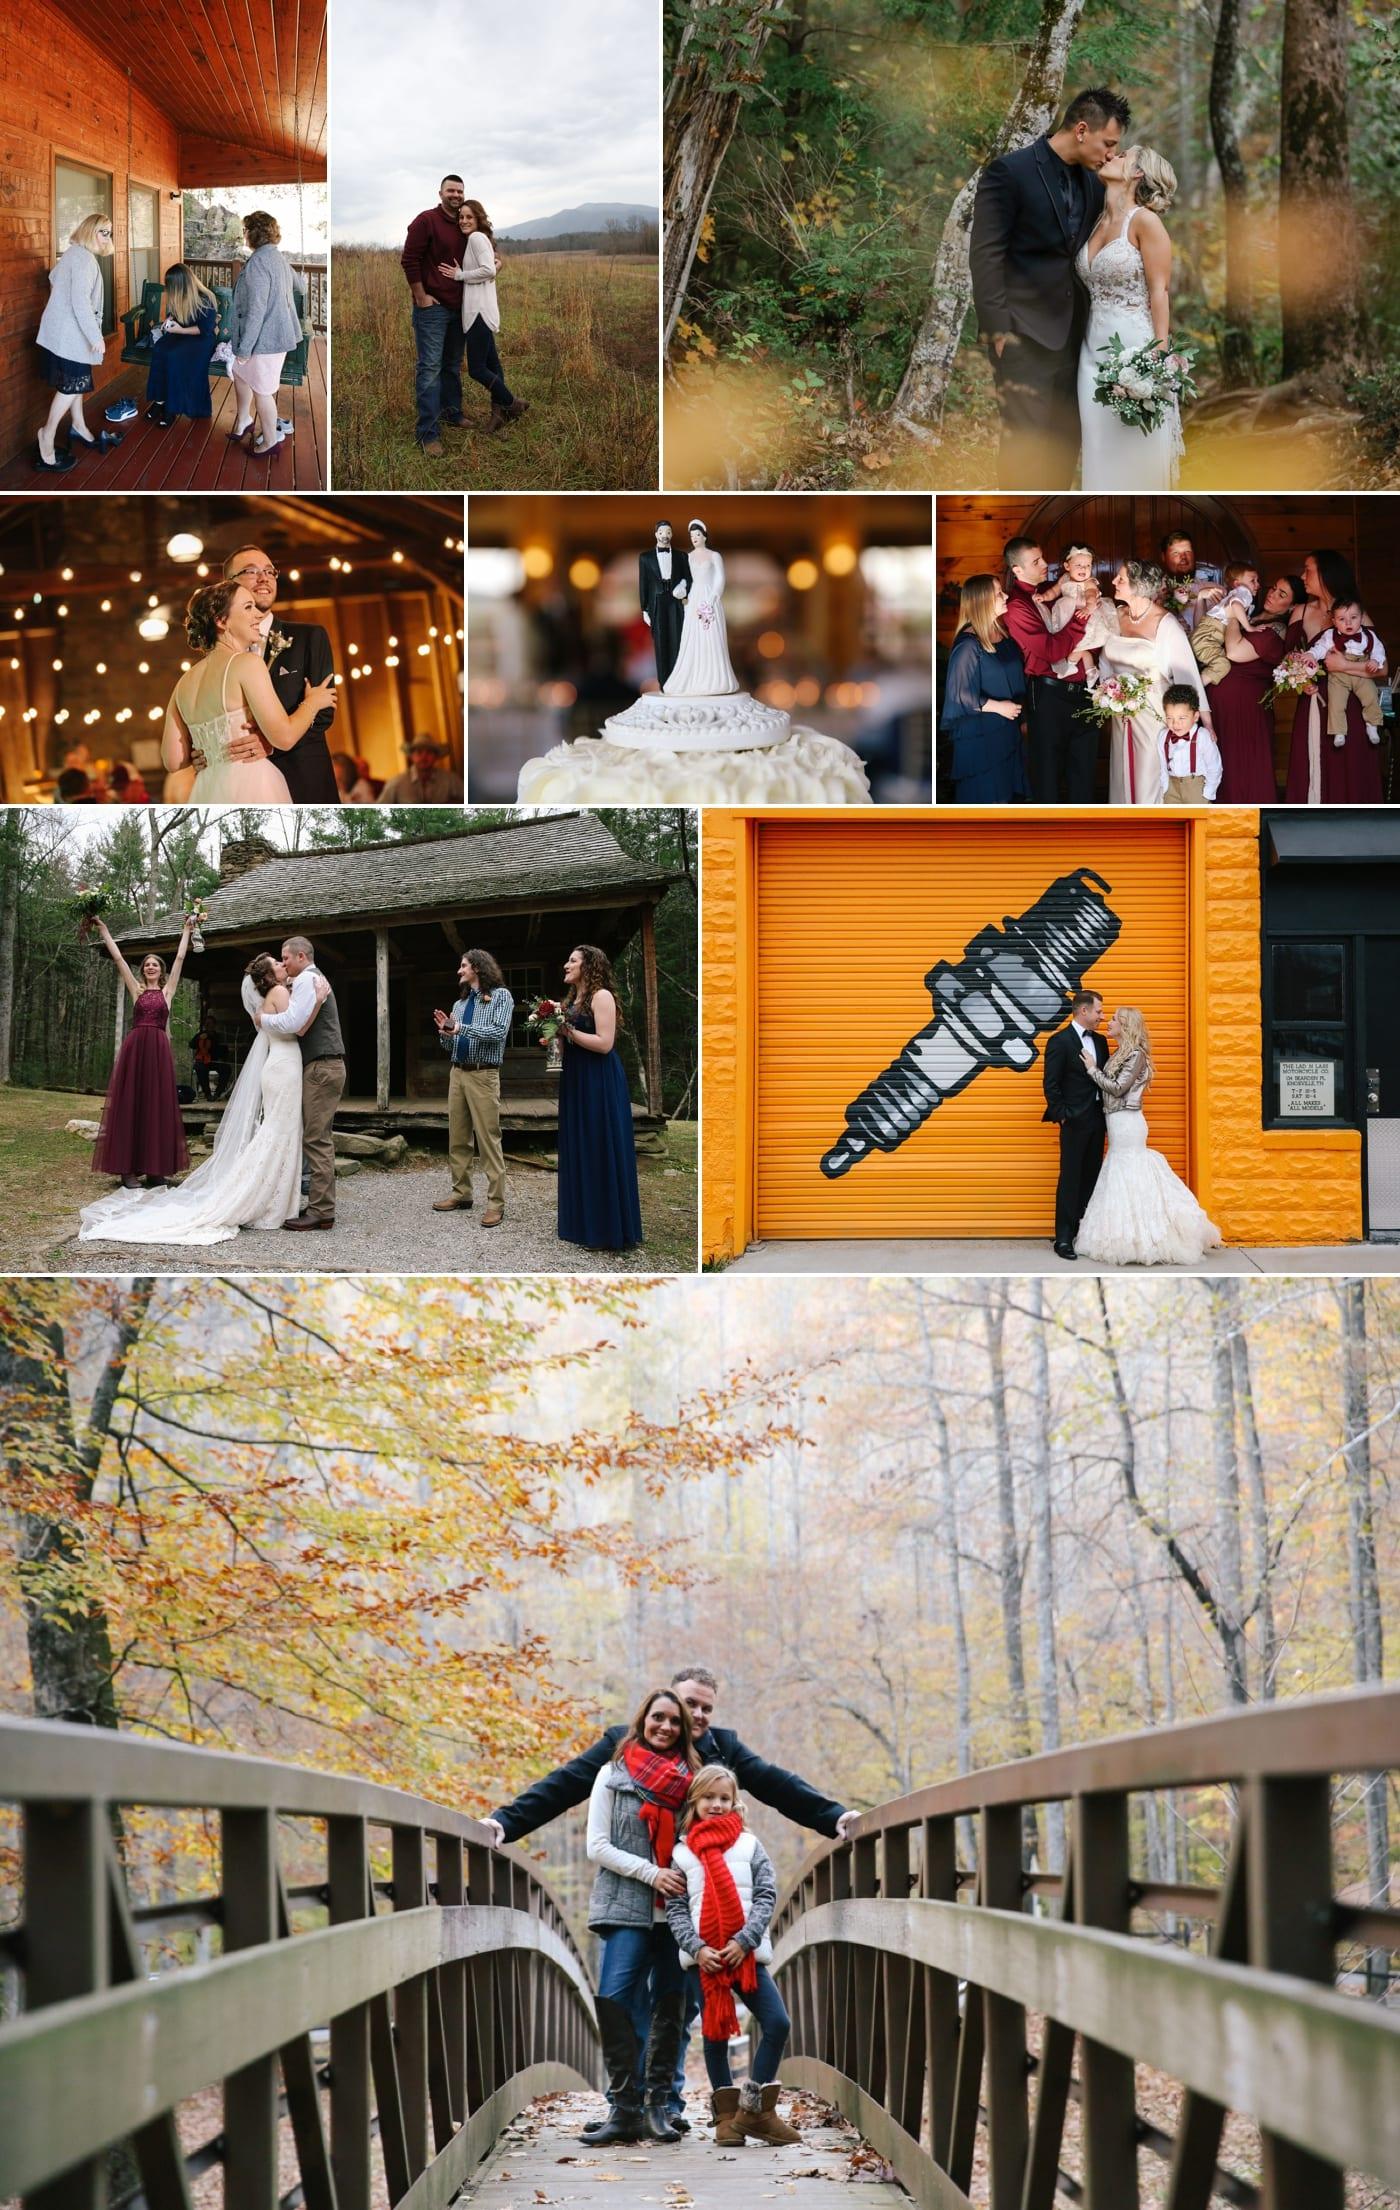 Knoxville wedding ideas